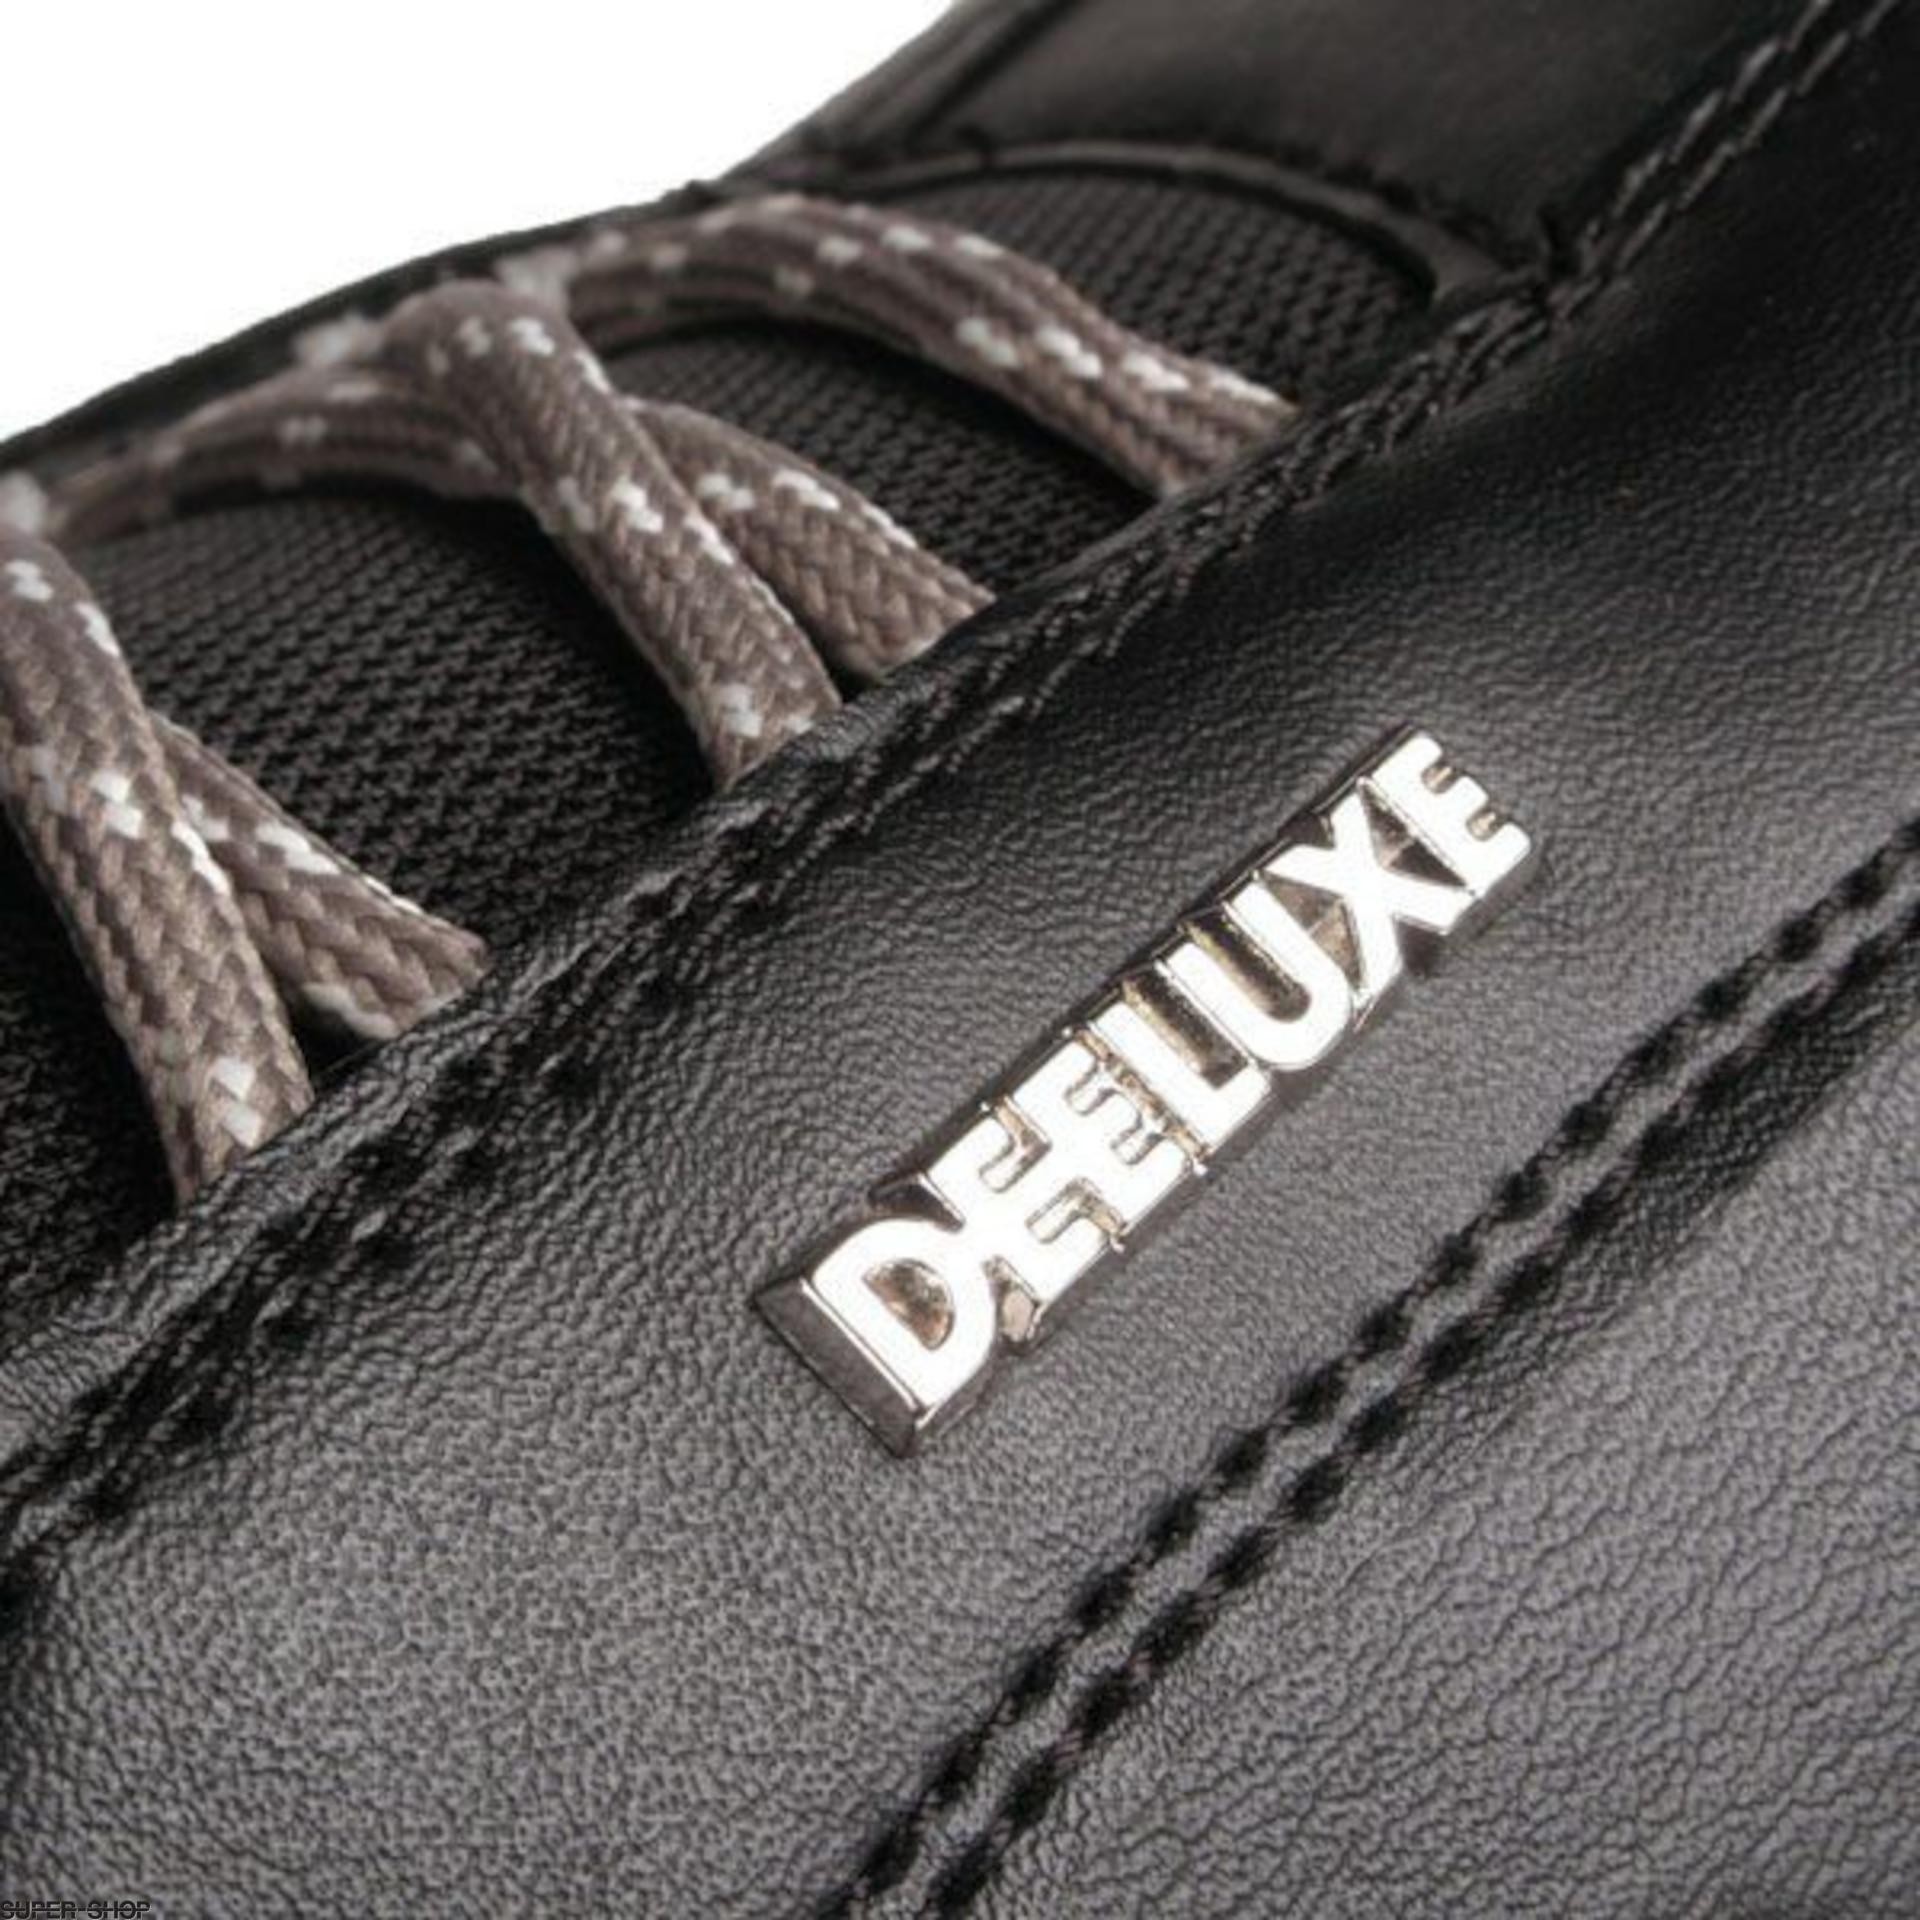 8264b2452ab5 DeeLuxe snowboard boots Daemon (black)